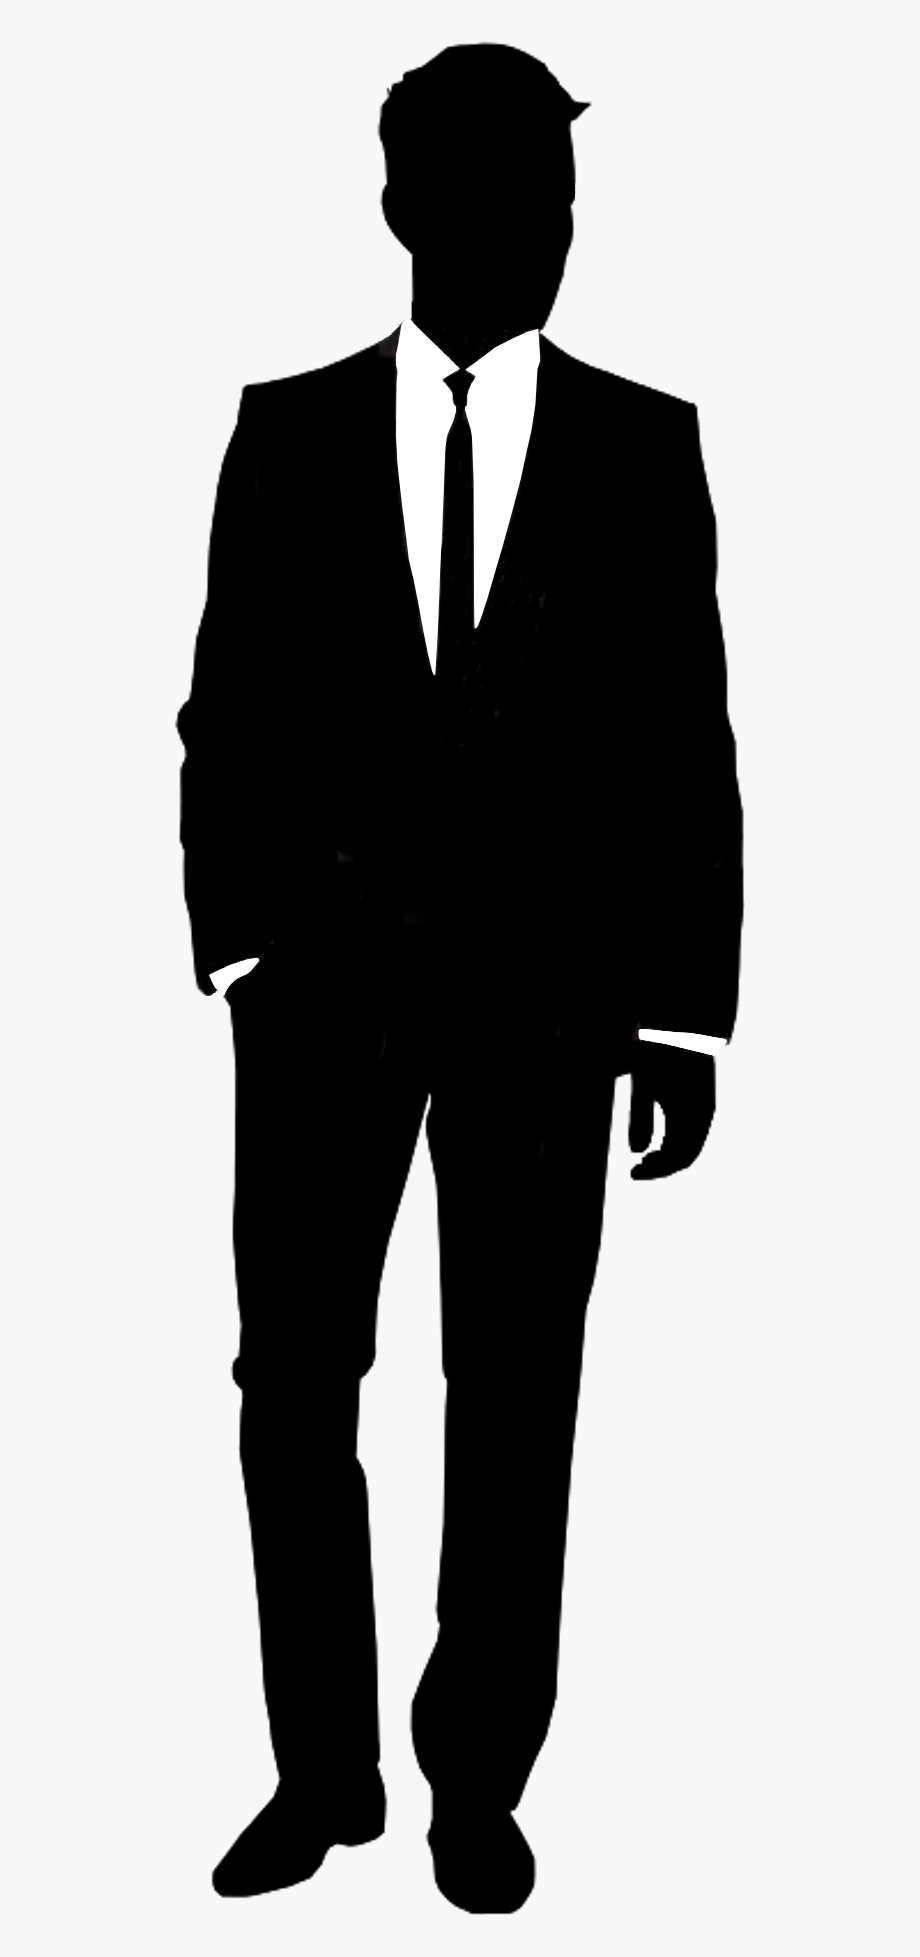 Suit Silhouette Shirt Informal Attire.